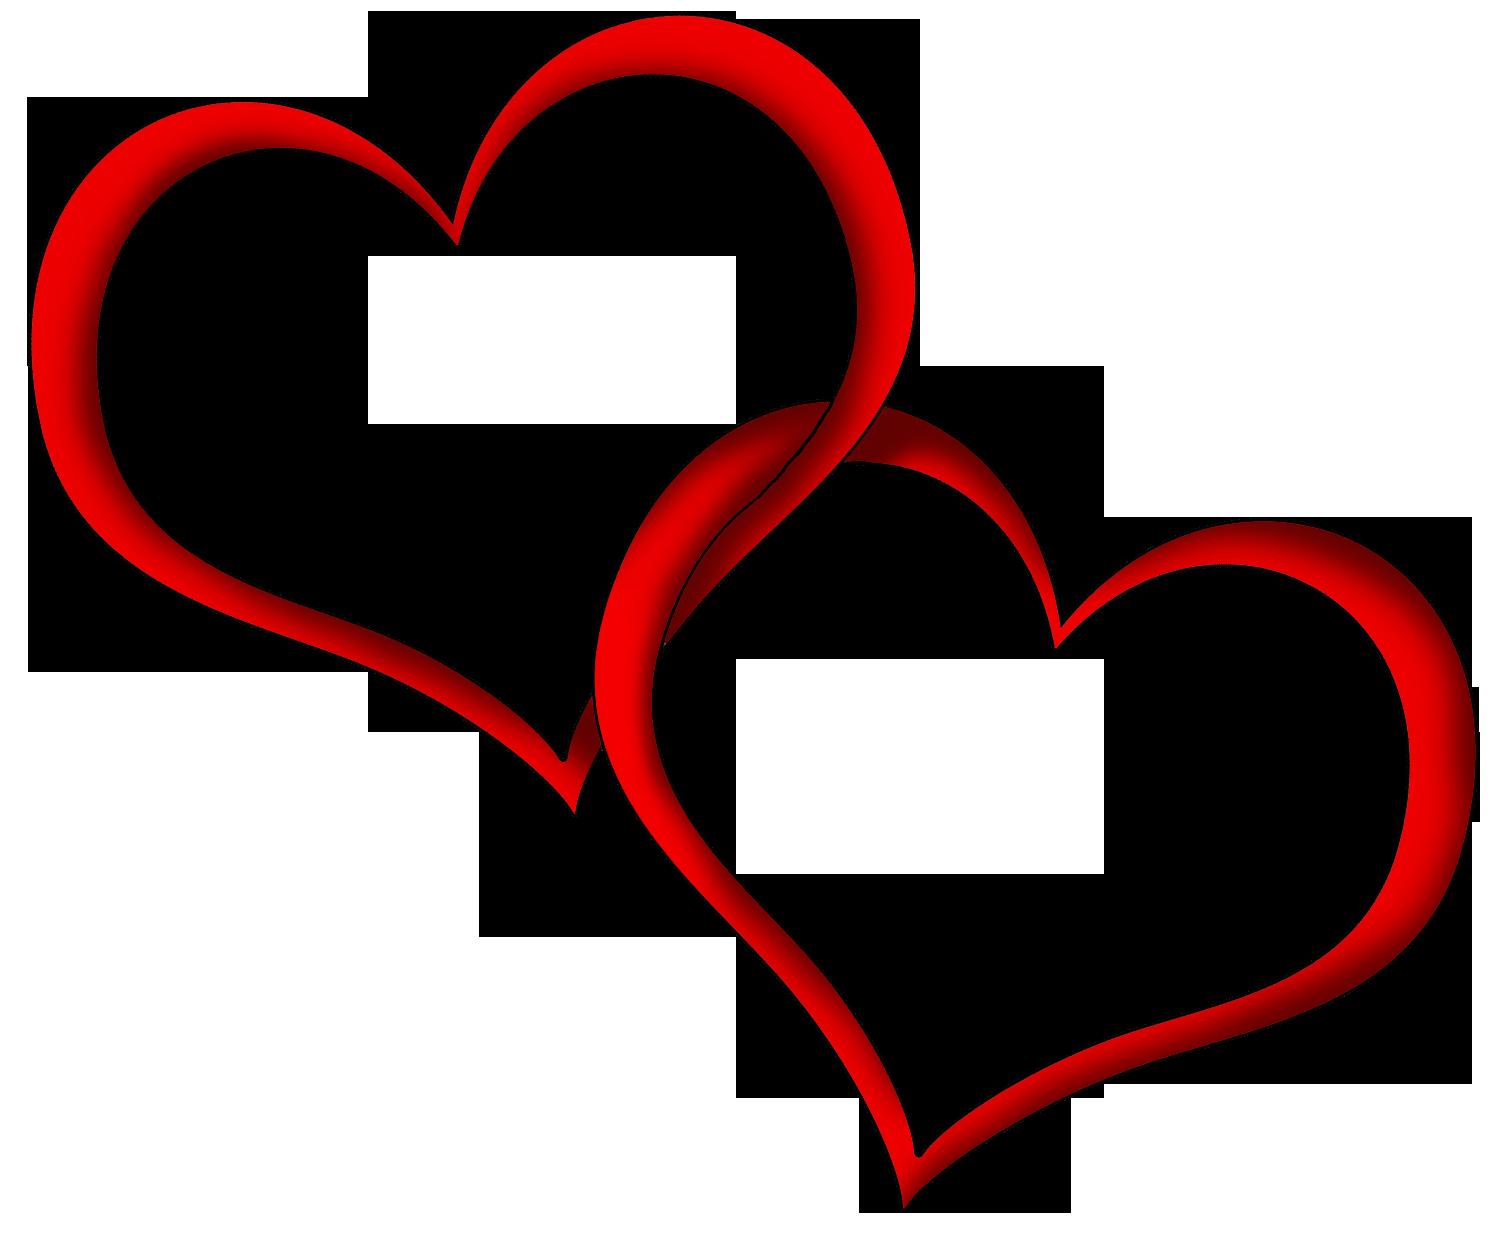 Hearts heart clip art images